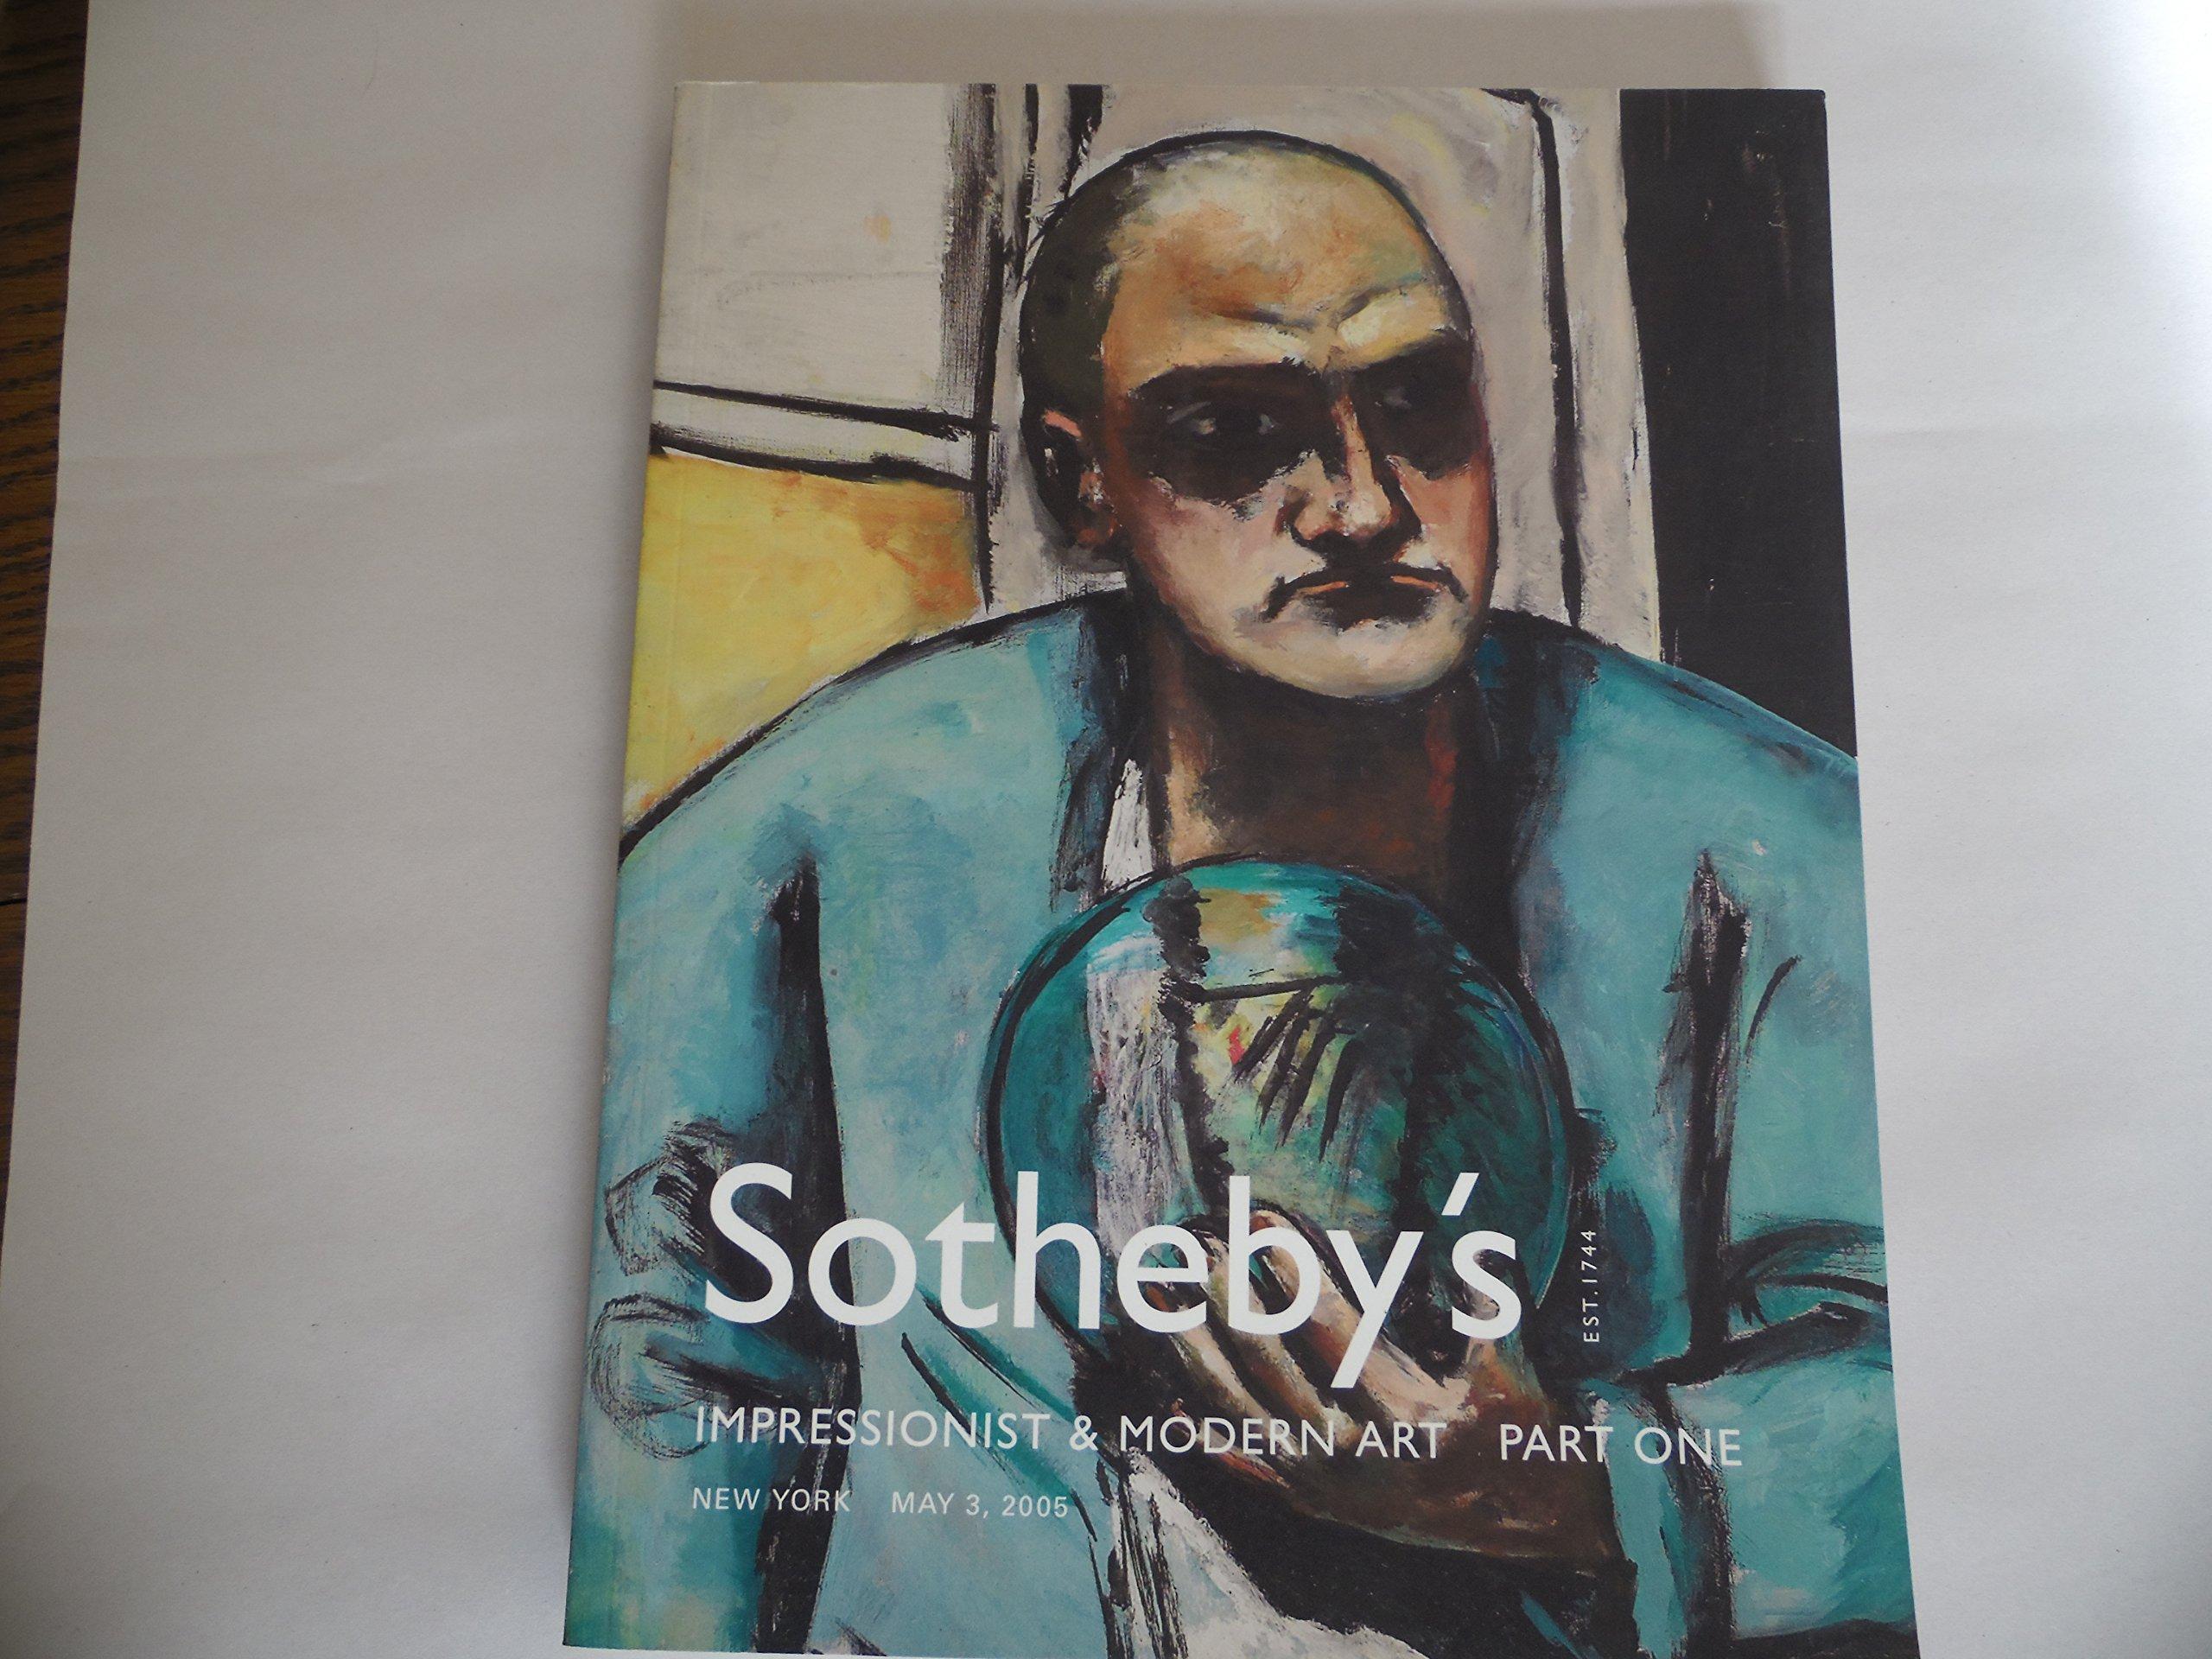 Sotheby's : Impressionist & Modern Art Part One : Impressionist & Modern Art Part One : May 3, 2005 : Sale N08089 pdf